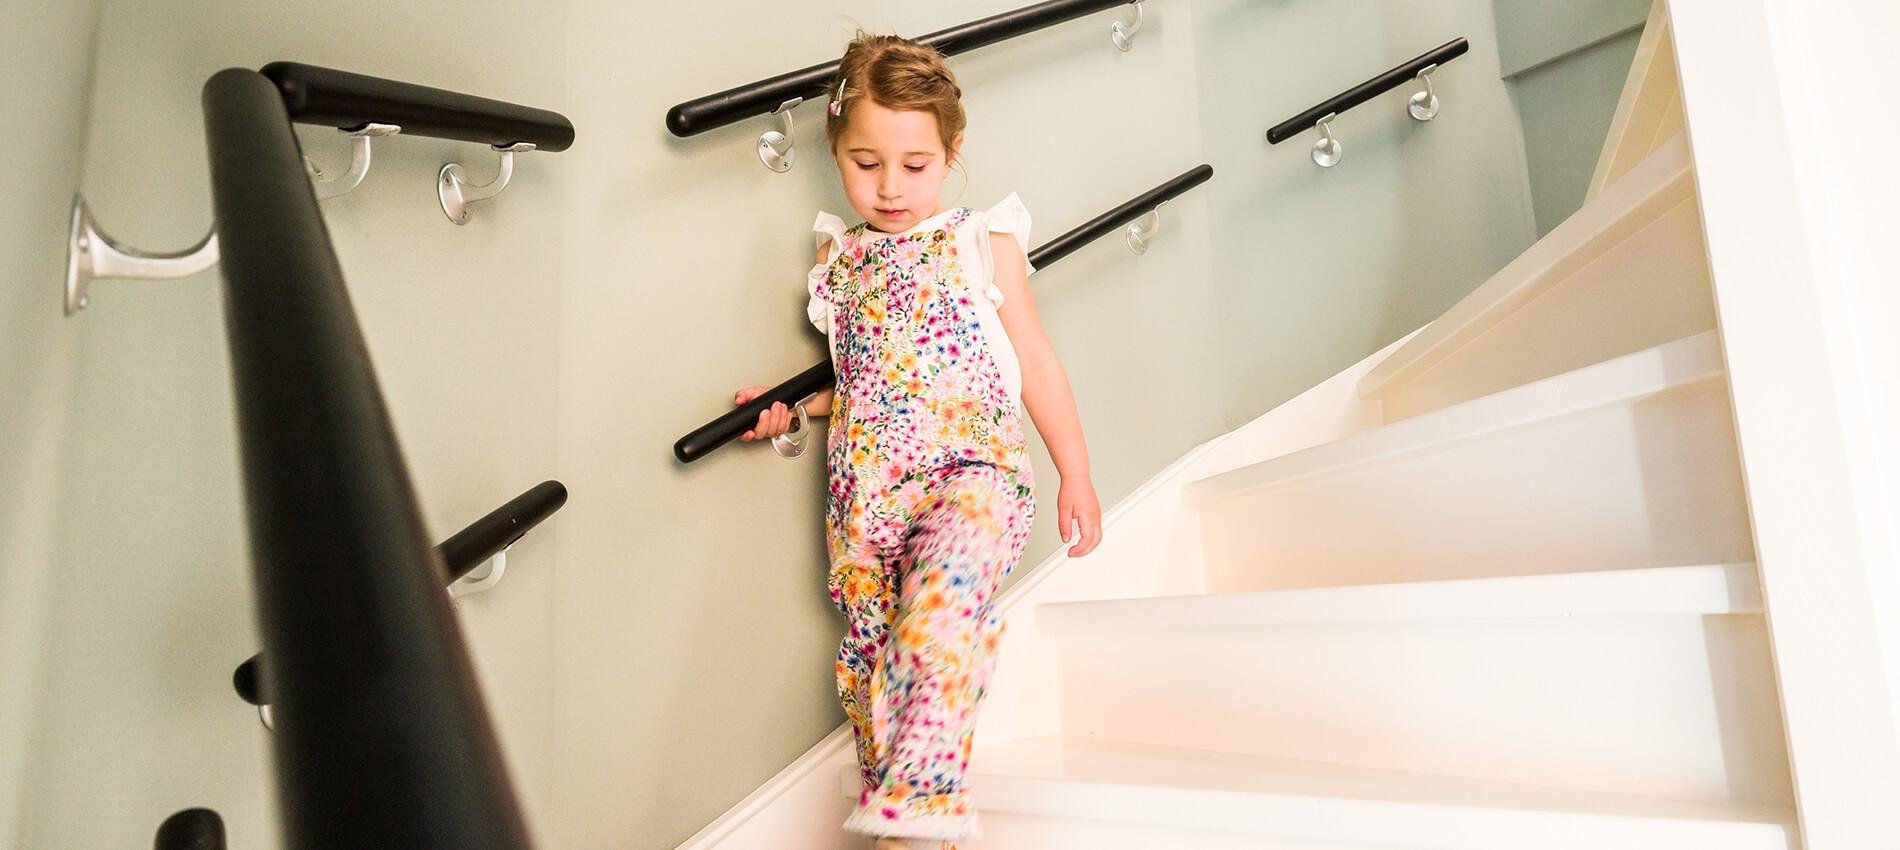 kindertrapleuning-veilig-duurzaam-4